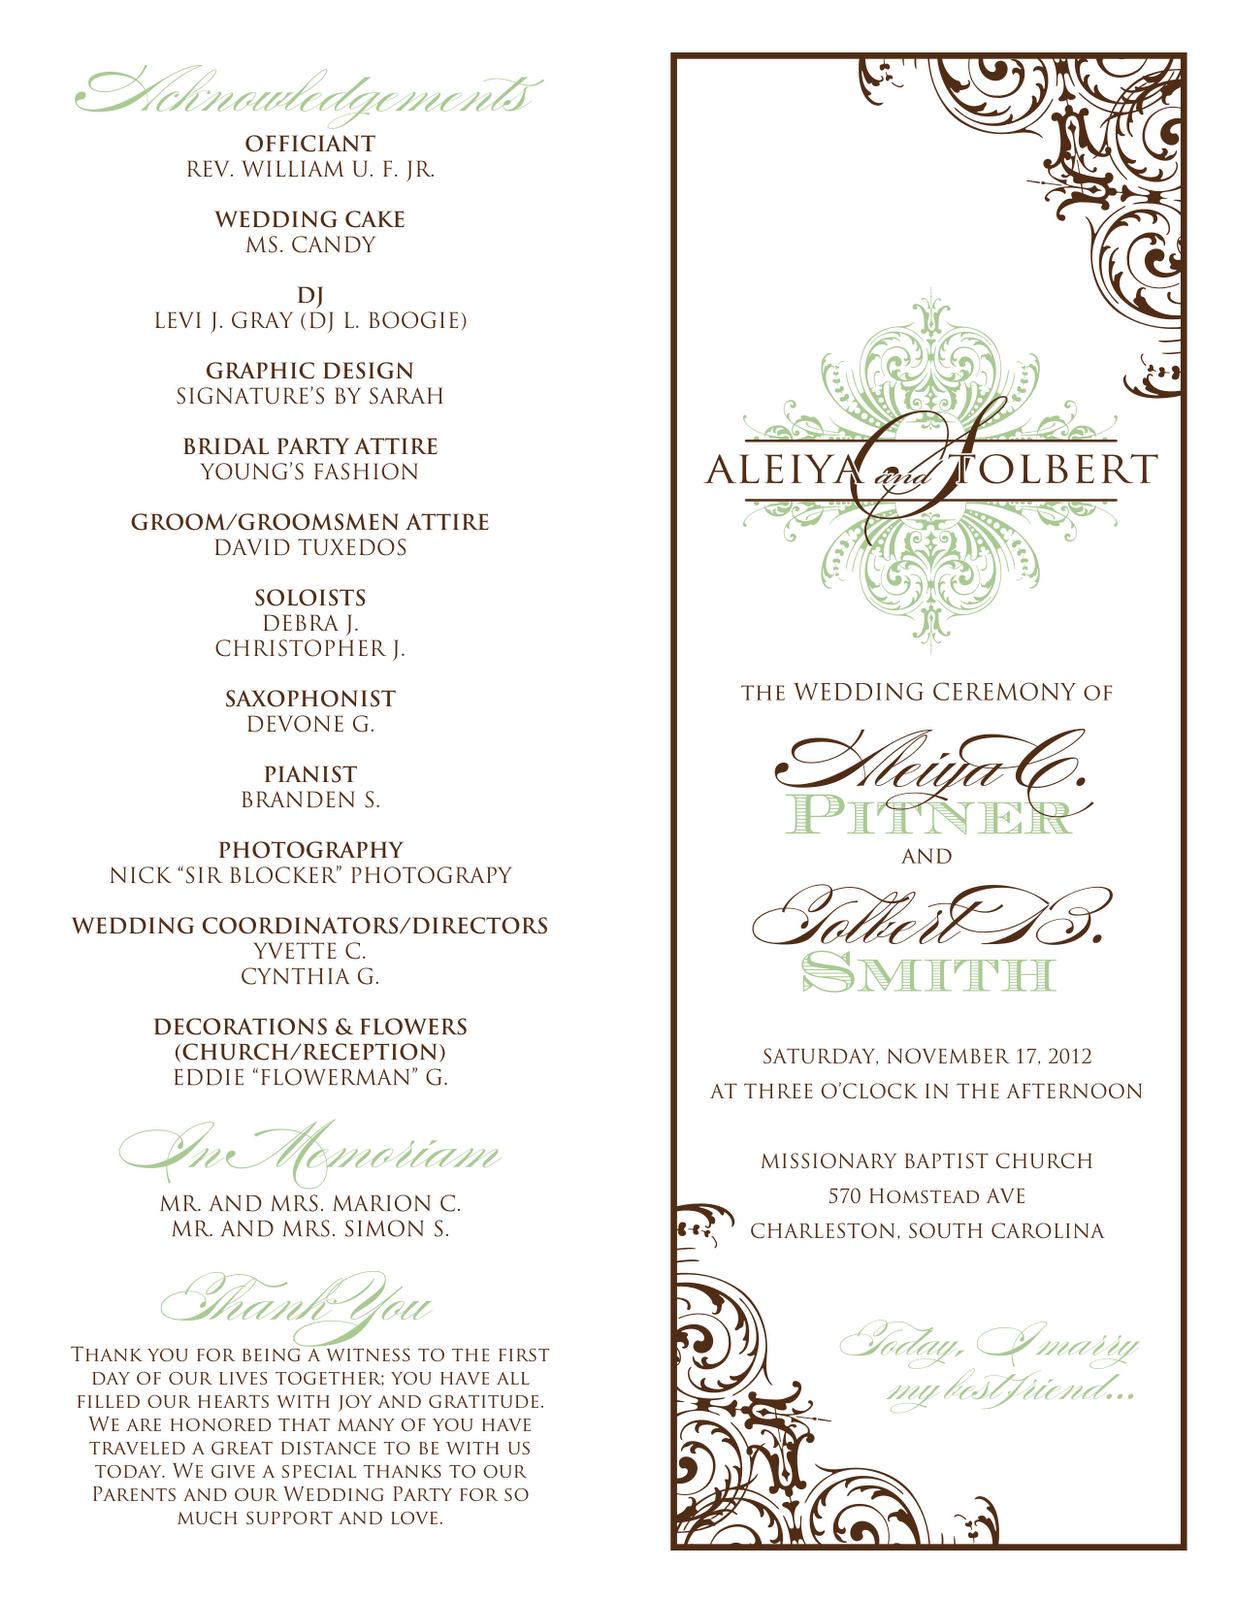 Wedding Card Signatures Card Design Using Wedding